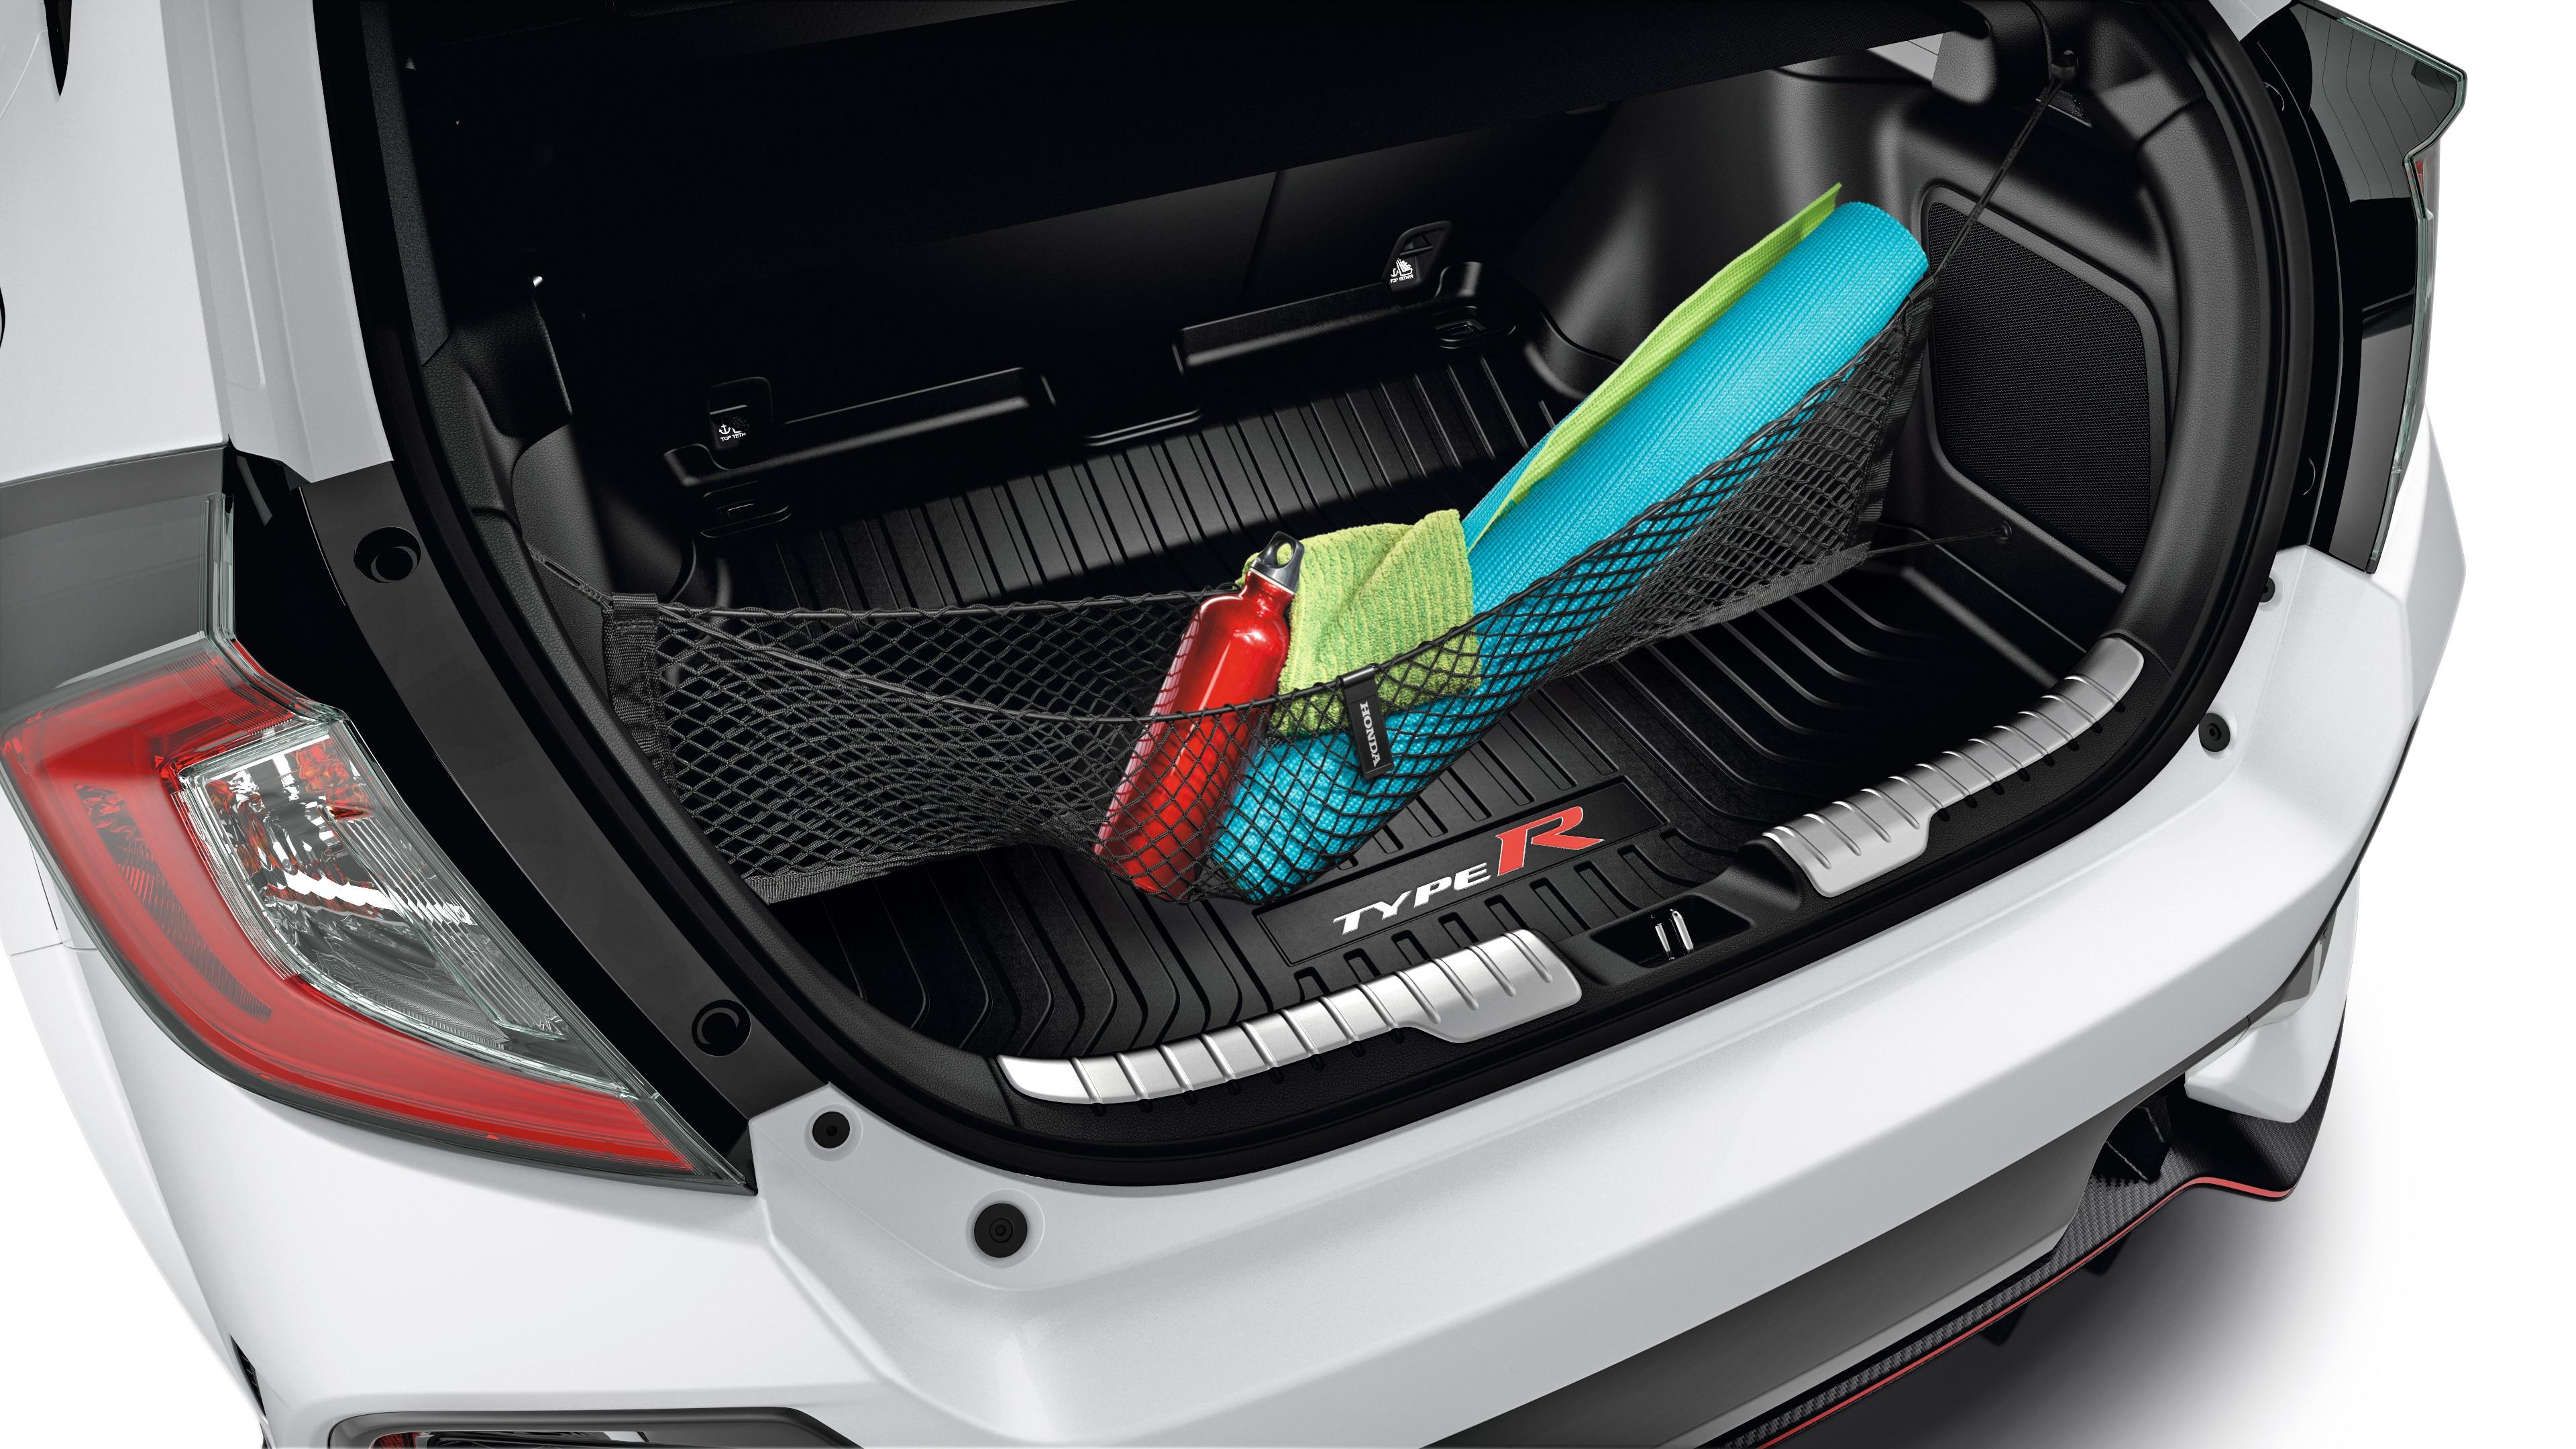 Accessories 2018 Civic Type R Honda Canada Diagram Engine Block Parts And Components Car Cargo Net